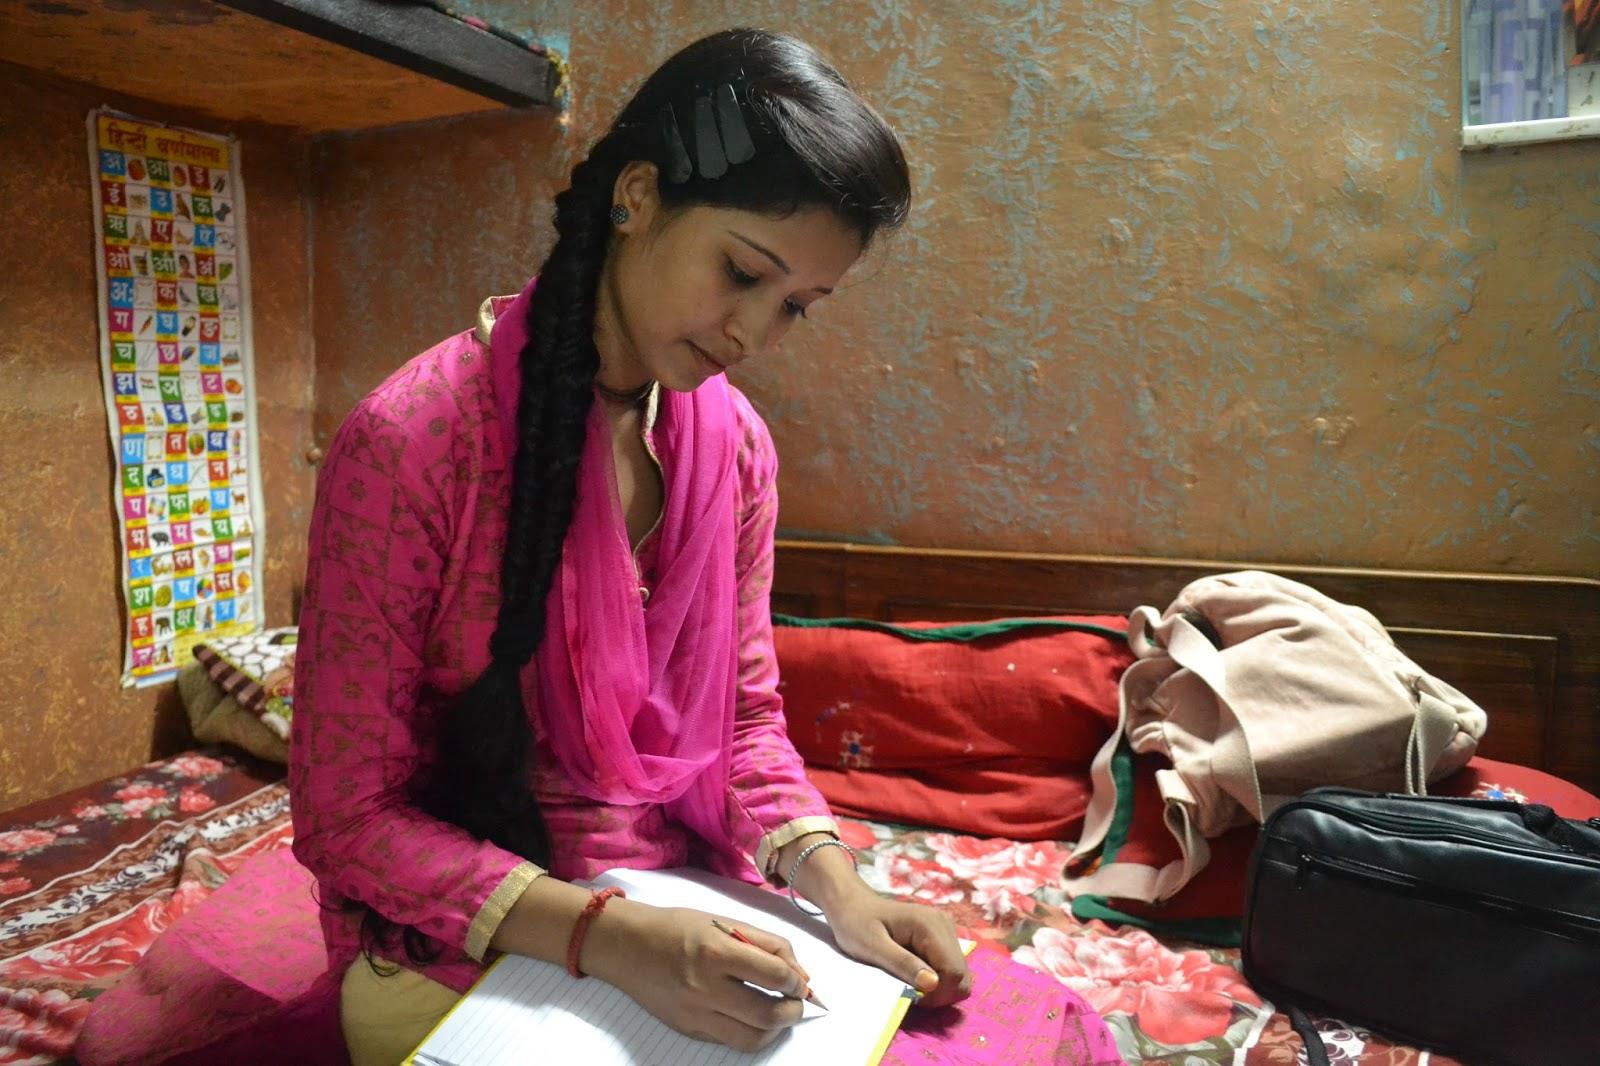 Sarkari Niyukti https://jhc.digiregister.online Sarkari Niyukti - Government Jobs in India - सरकारी नियुक्ति | Image Courtesy - https://3.bp.blogspot.com/-C29-5CHpqGM/V6GdLaUdU1I/AAAAAAAABTY/Ebhd_k_f1iw0J1nphOMvHAoixILrcQlcQCLcB/s1600/DSC_0530.JPG